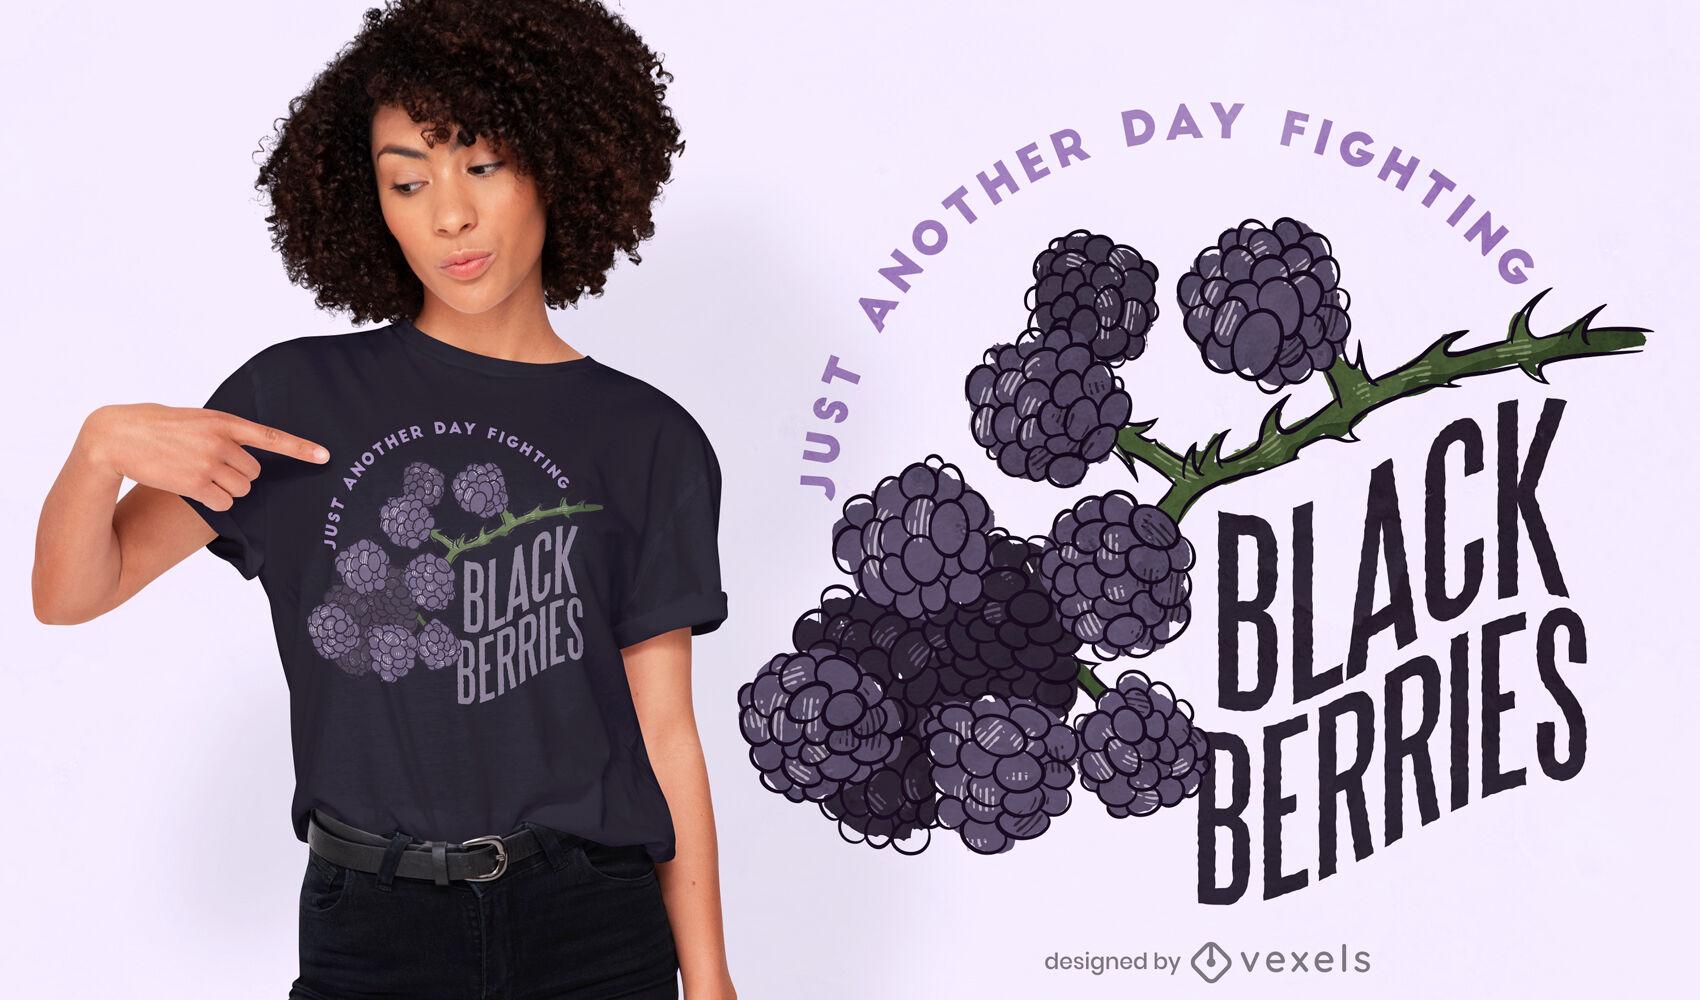 Cool fighting black berries t-shirt design